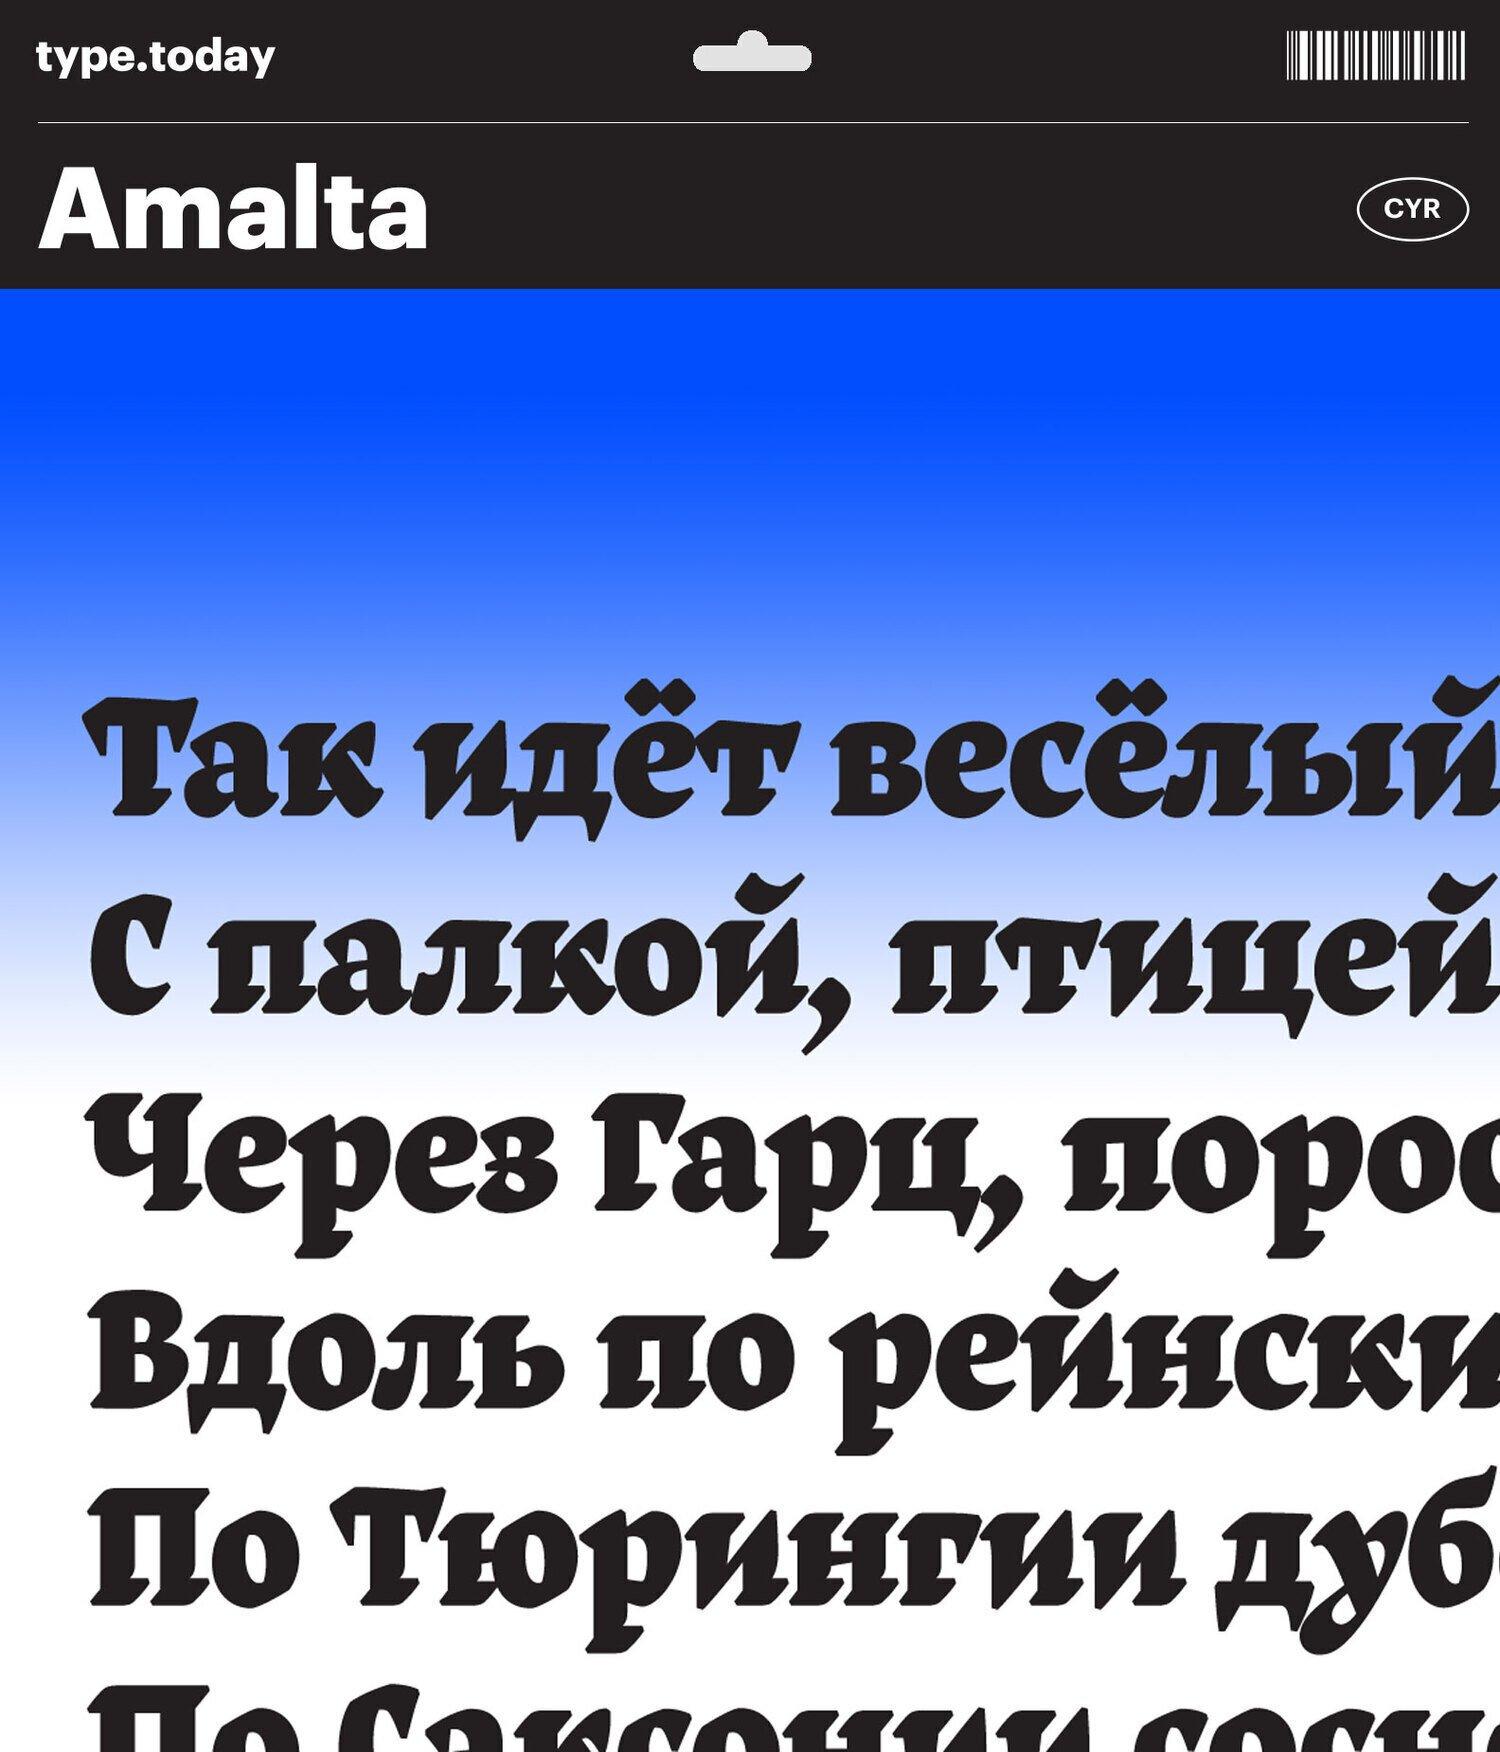 TT_Amalta_BodyCyr1